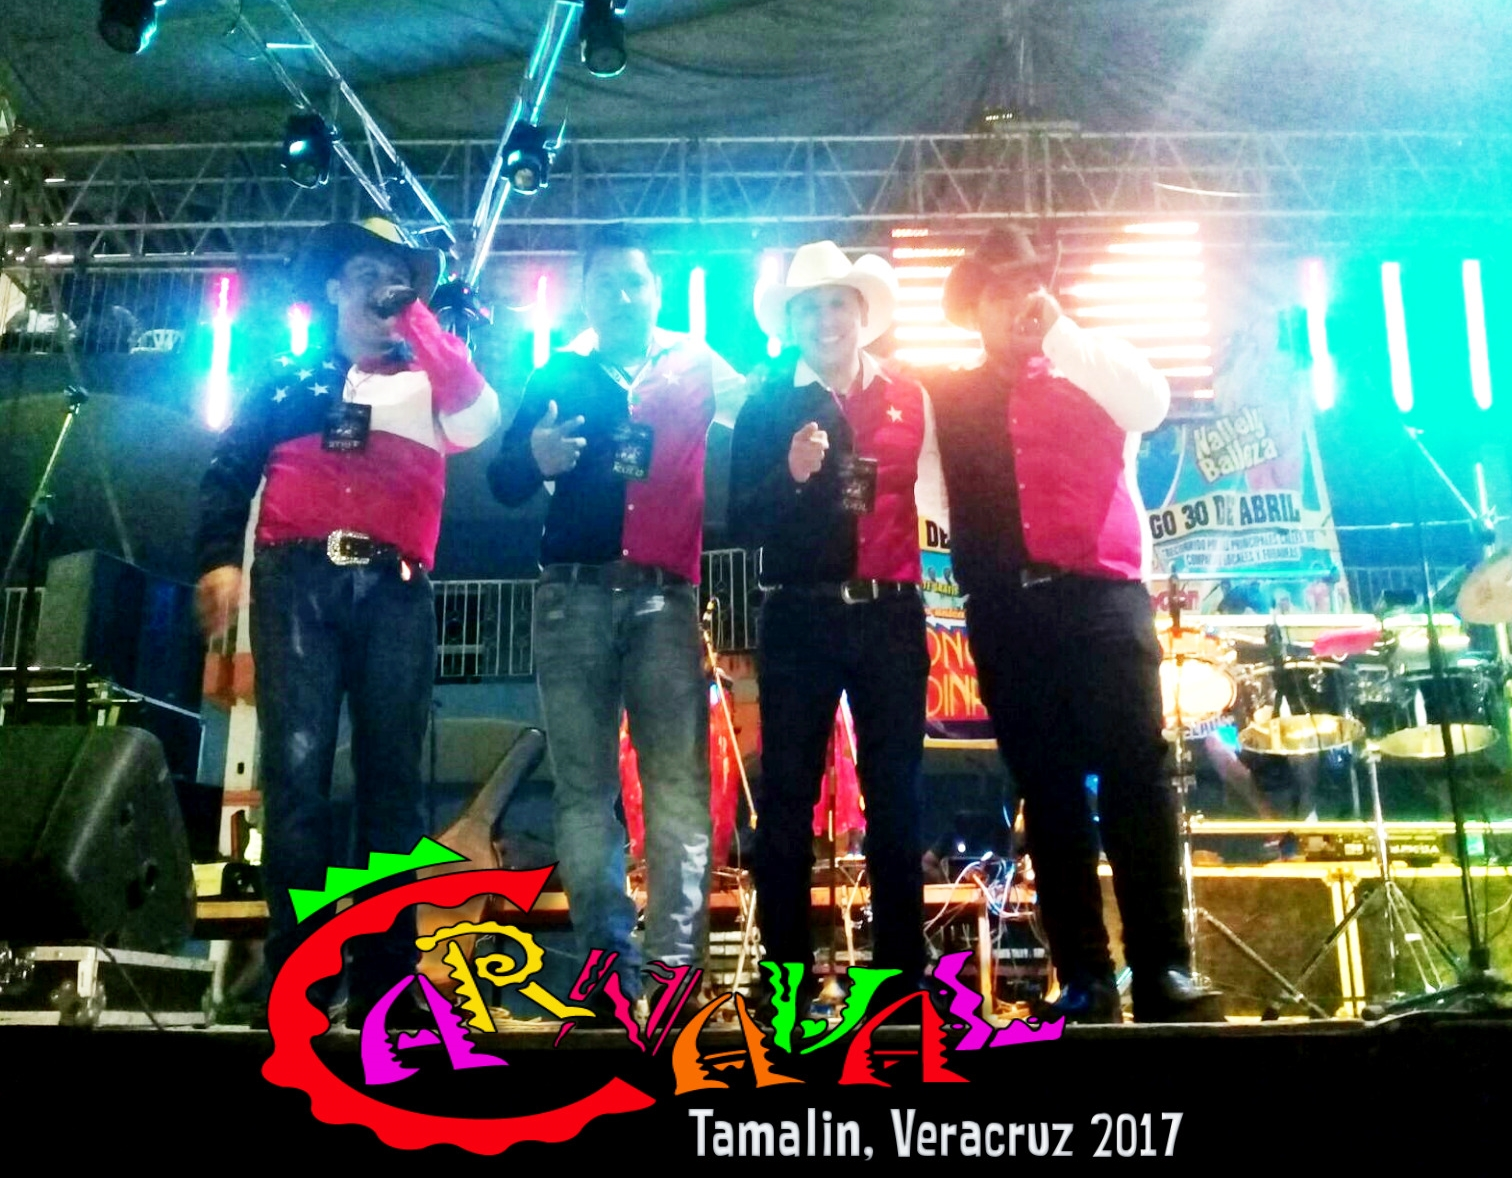 Carnaval Tamalin Veracruz 2017